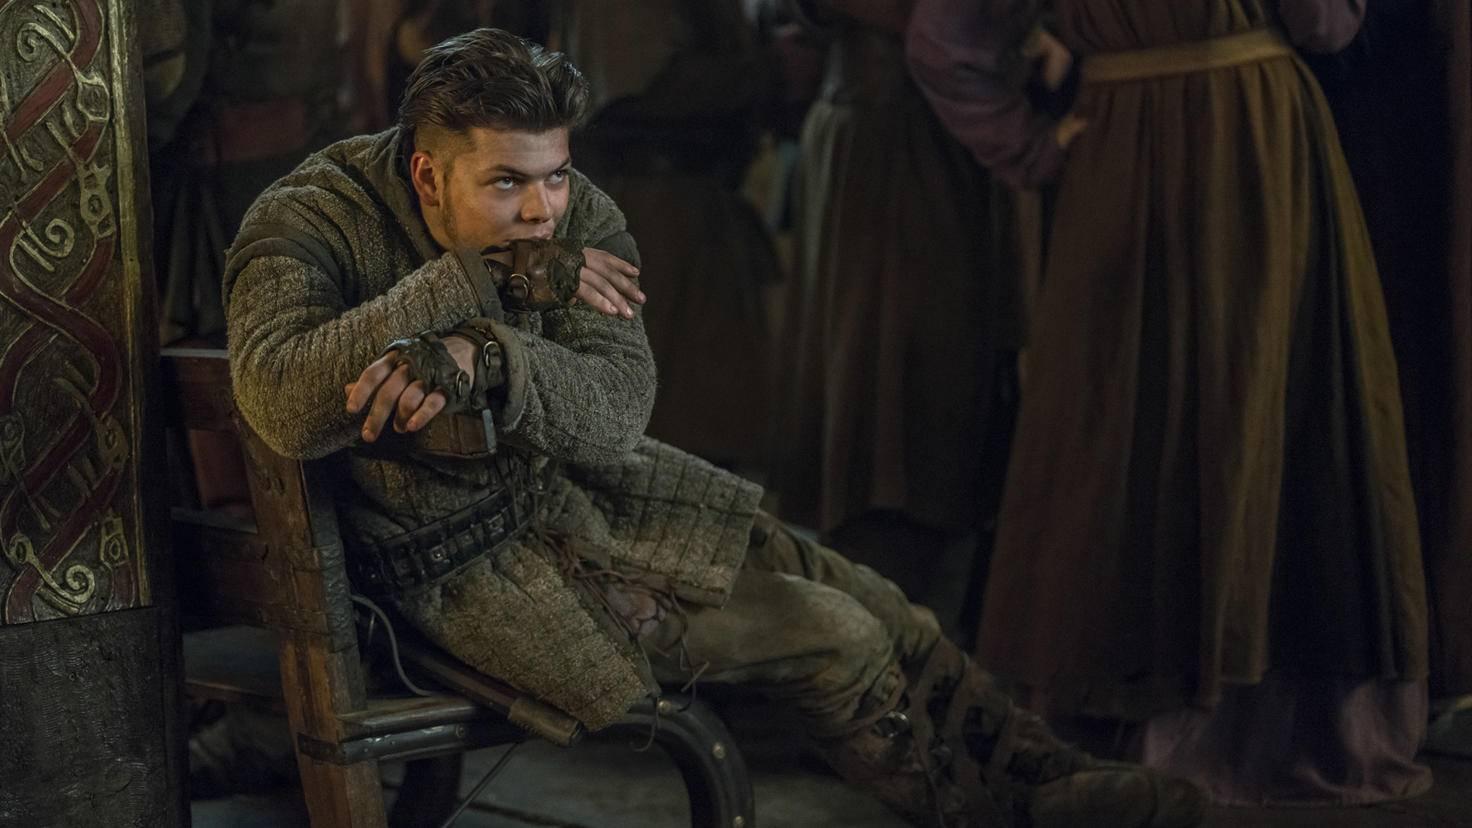 Ivar Staffel 4 Part 2 Vikings